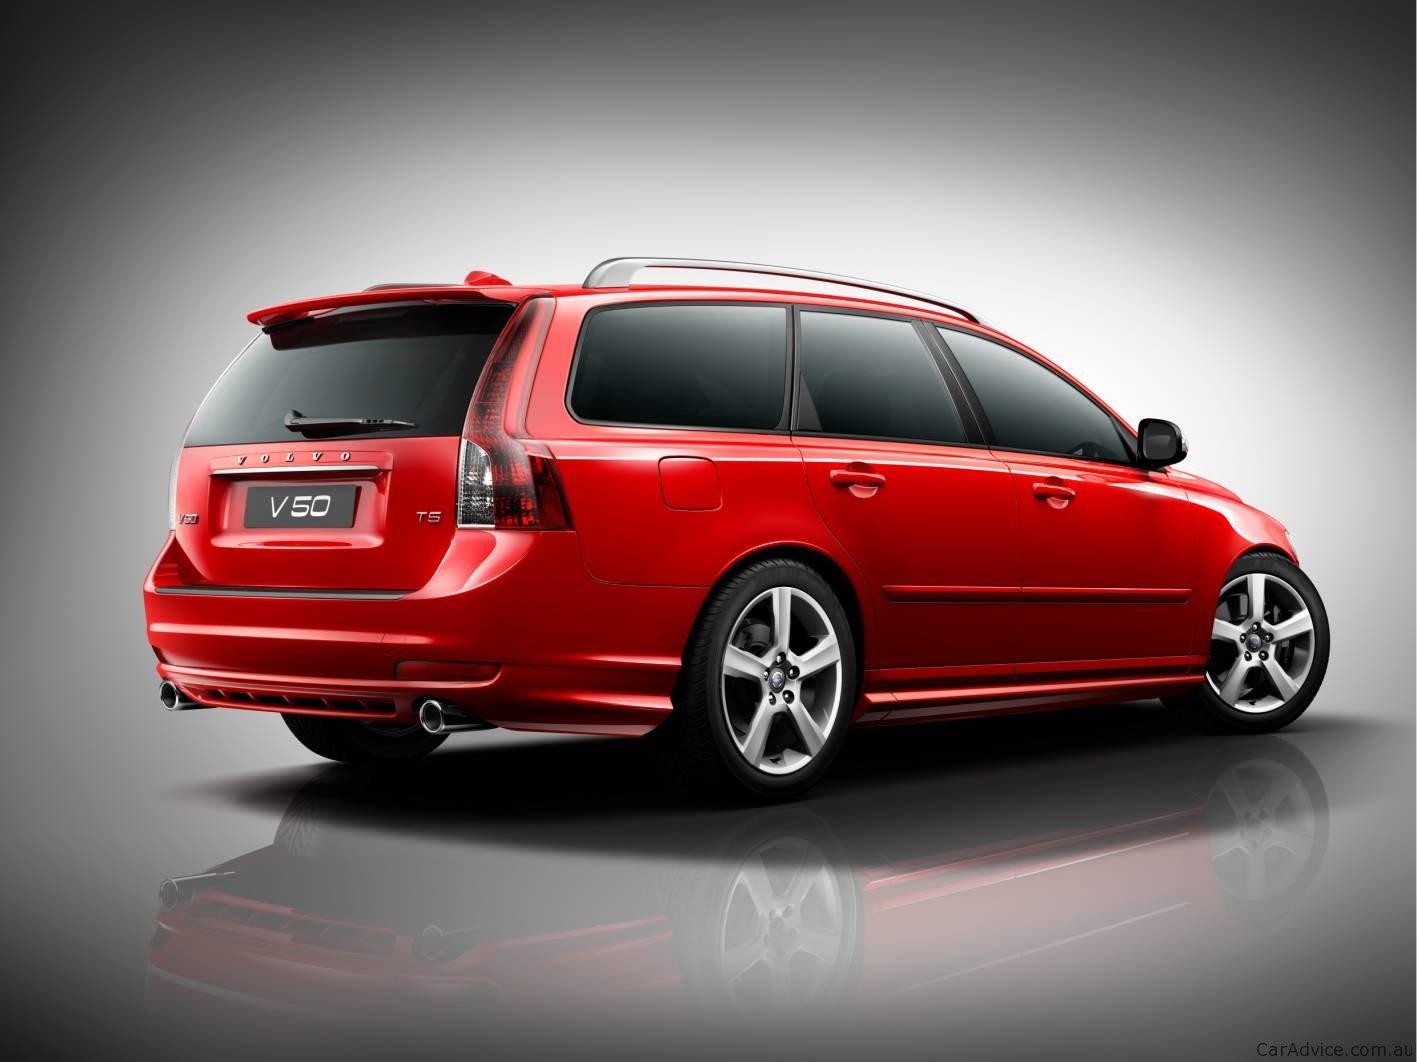 2012 Volvo S40 V50 Updates On Sale In Australia Photos